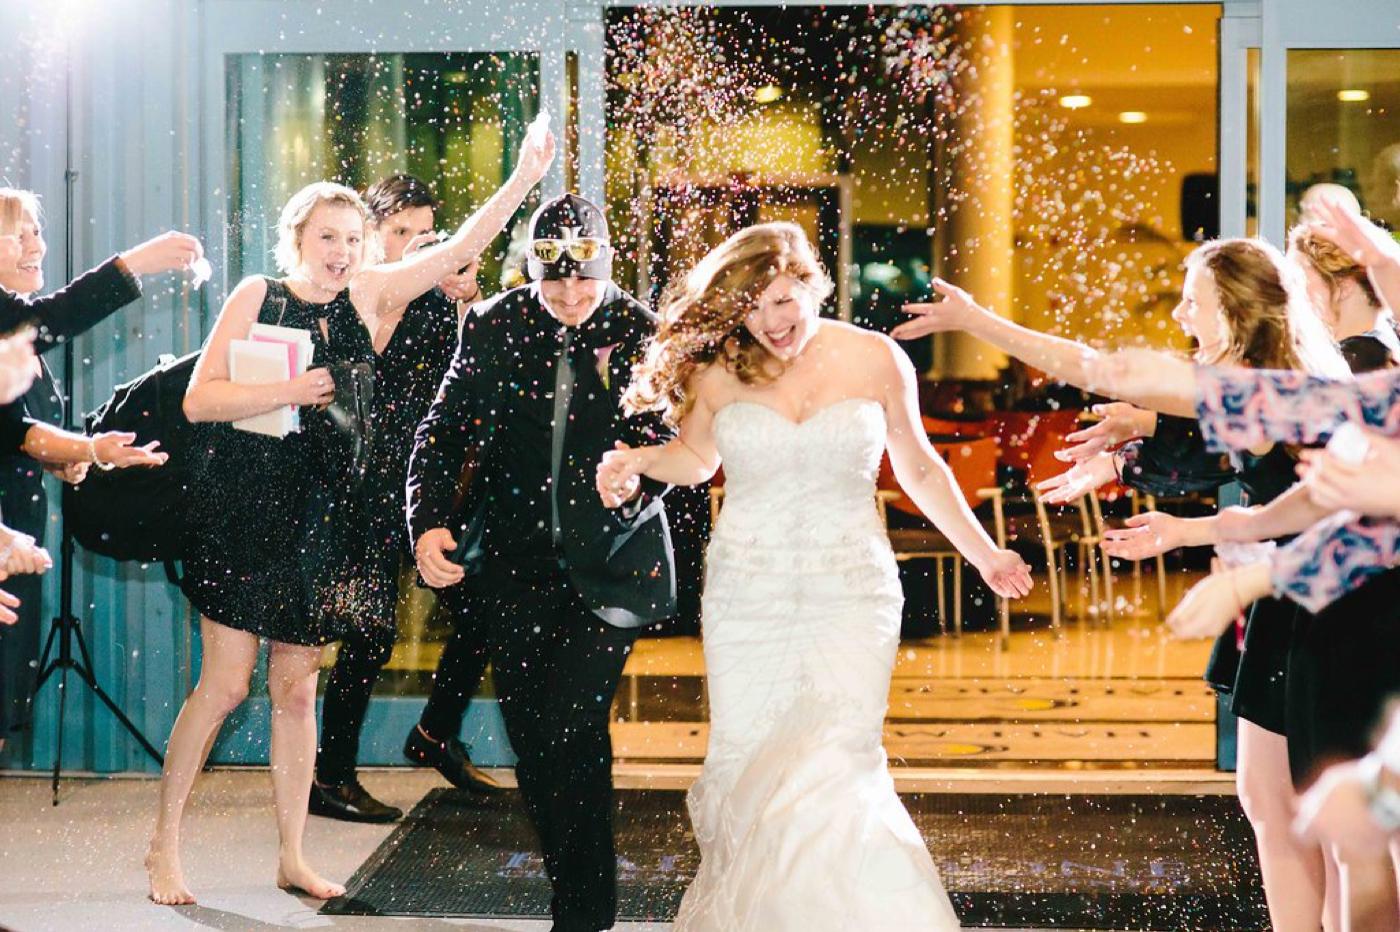 chicago-fine-art-wedding-photography-burnette31